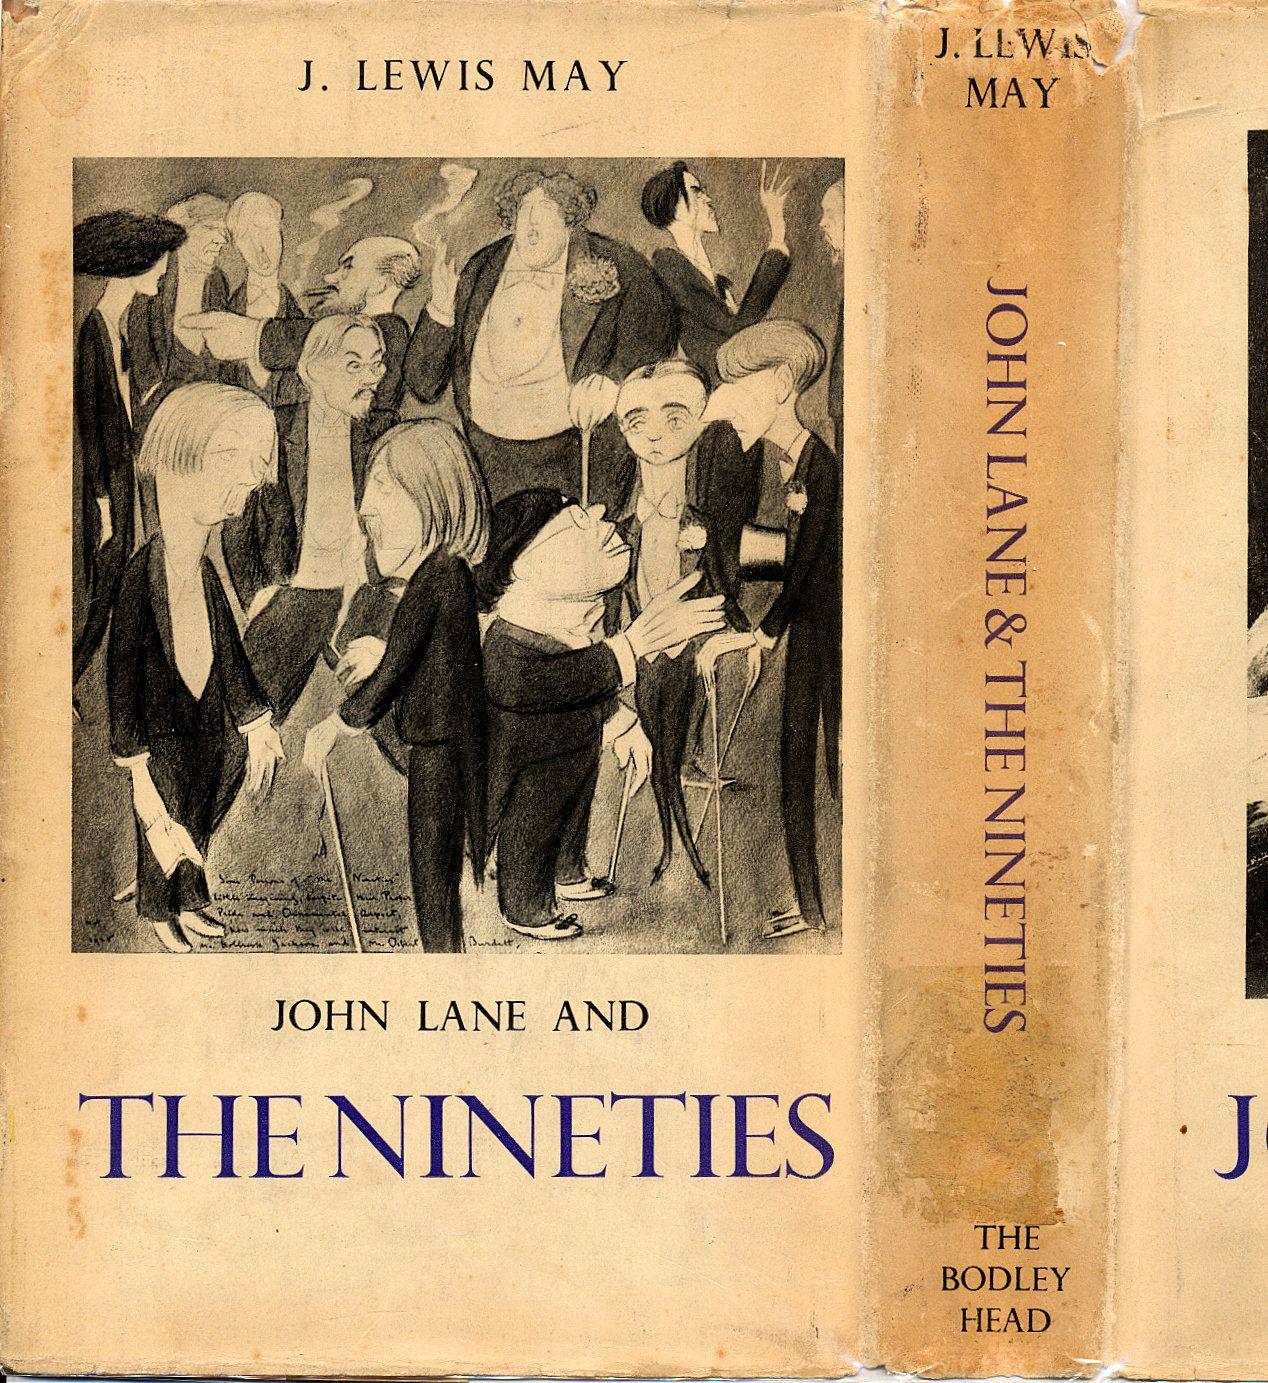 Edward Heron-Allen: Dust Jacket, John Lane and the Nineties. John Lane was nemesis to Heron-Allen in the Sette of Odd Volumes.